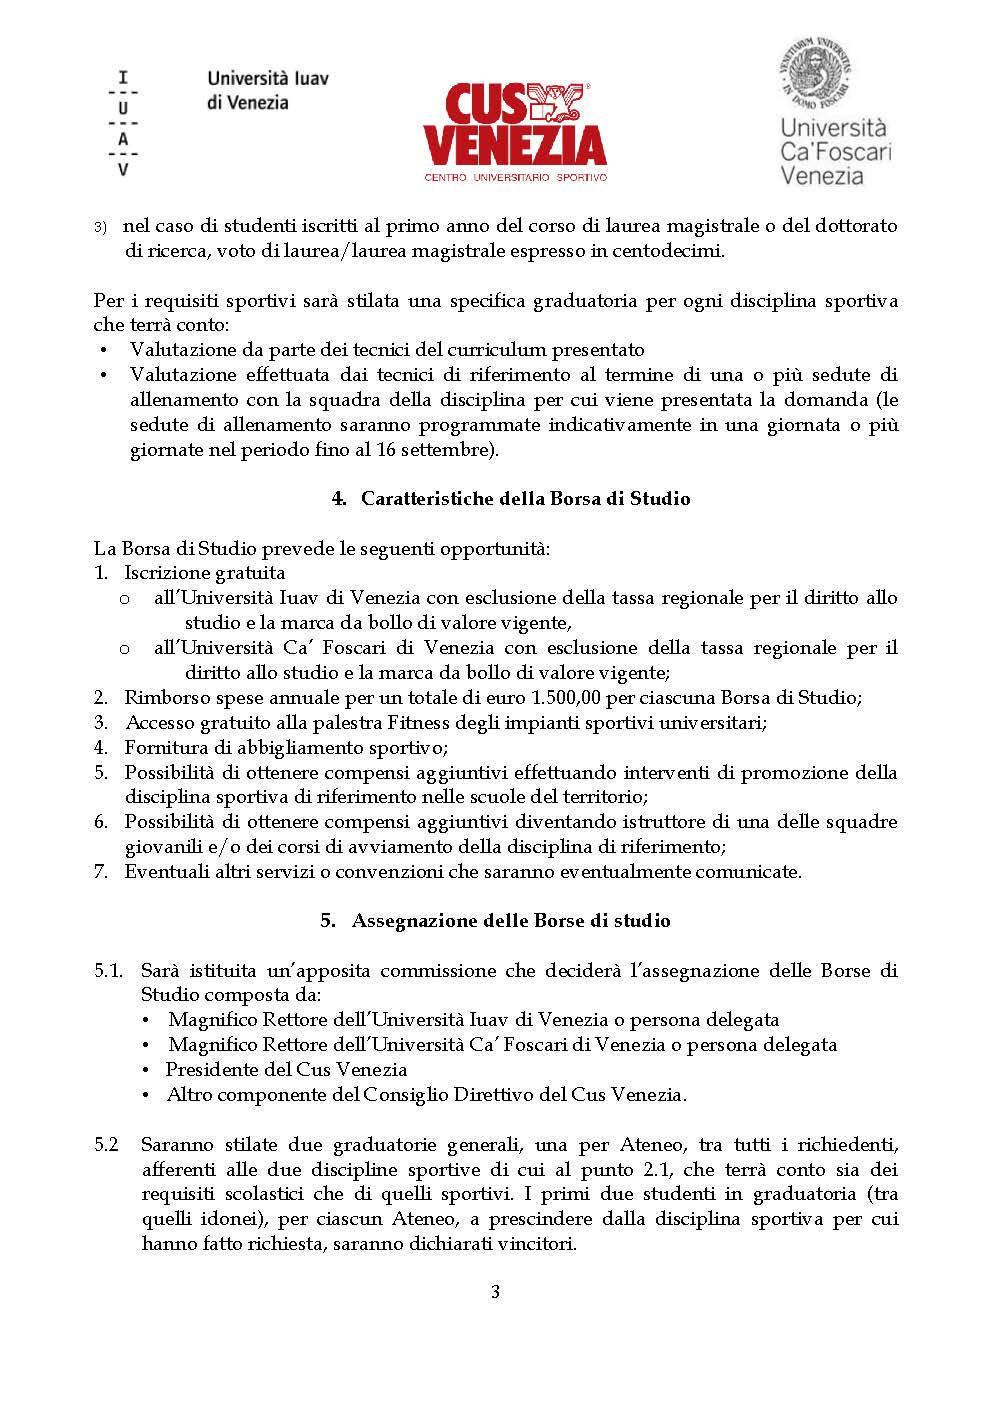 Calendario Lauree Ca Foscari.Nuovo Bando Borse Di Studio Cus Venezia